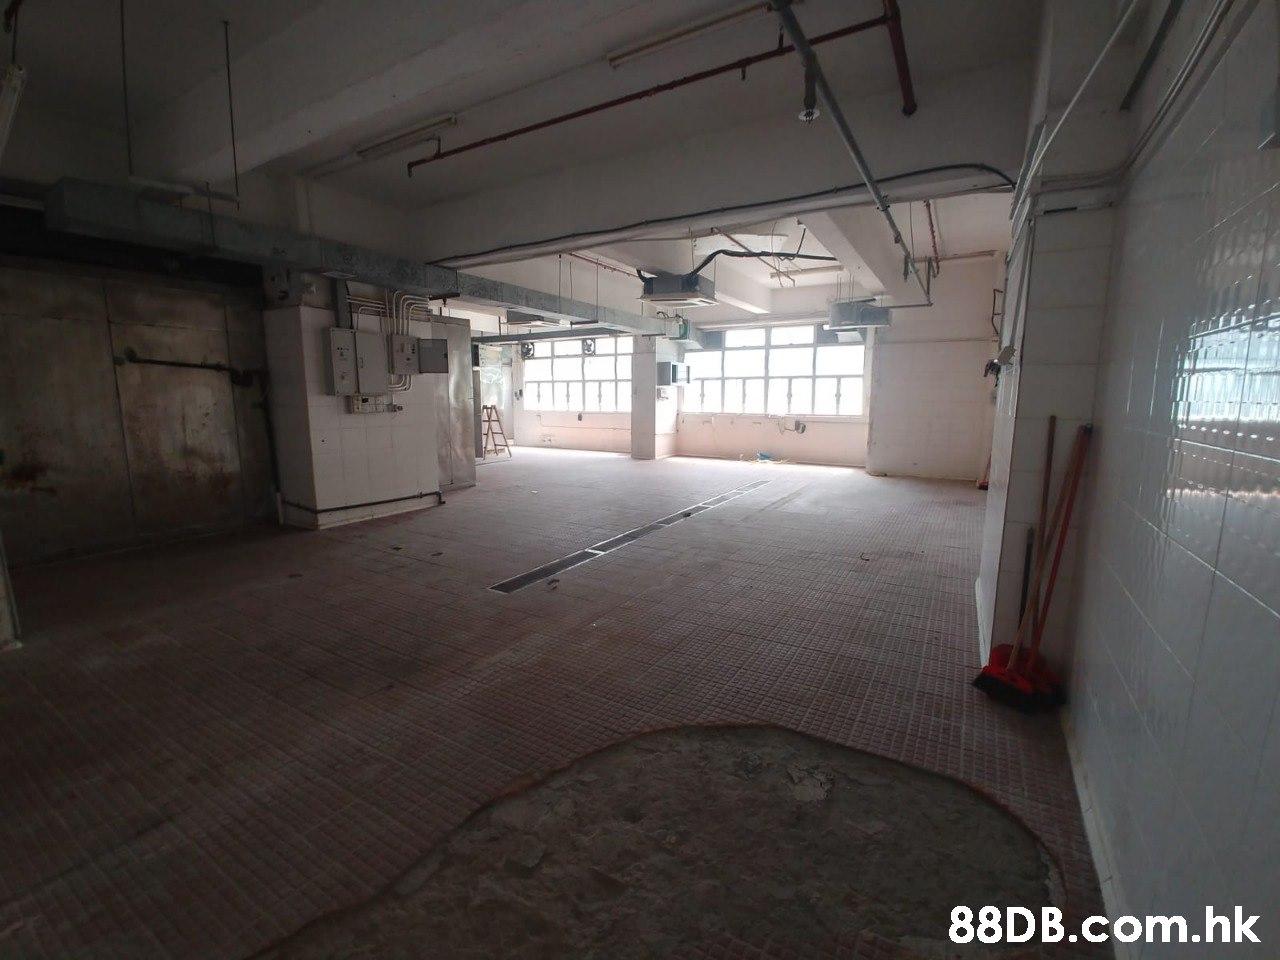 .hk  Building,Floor,Flooring,